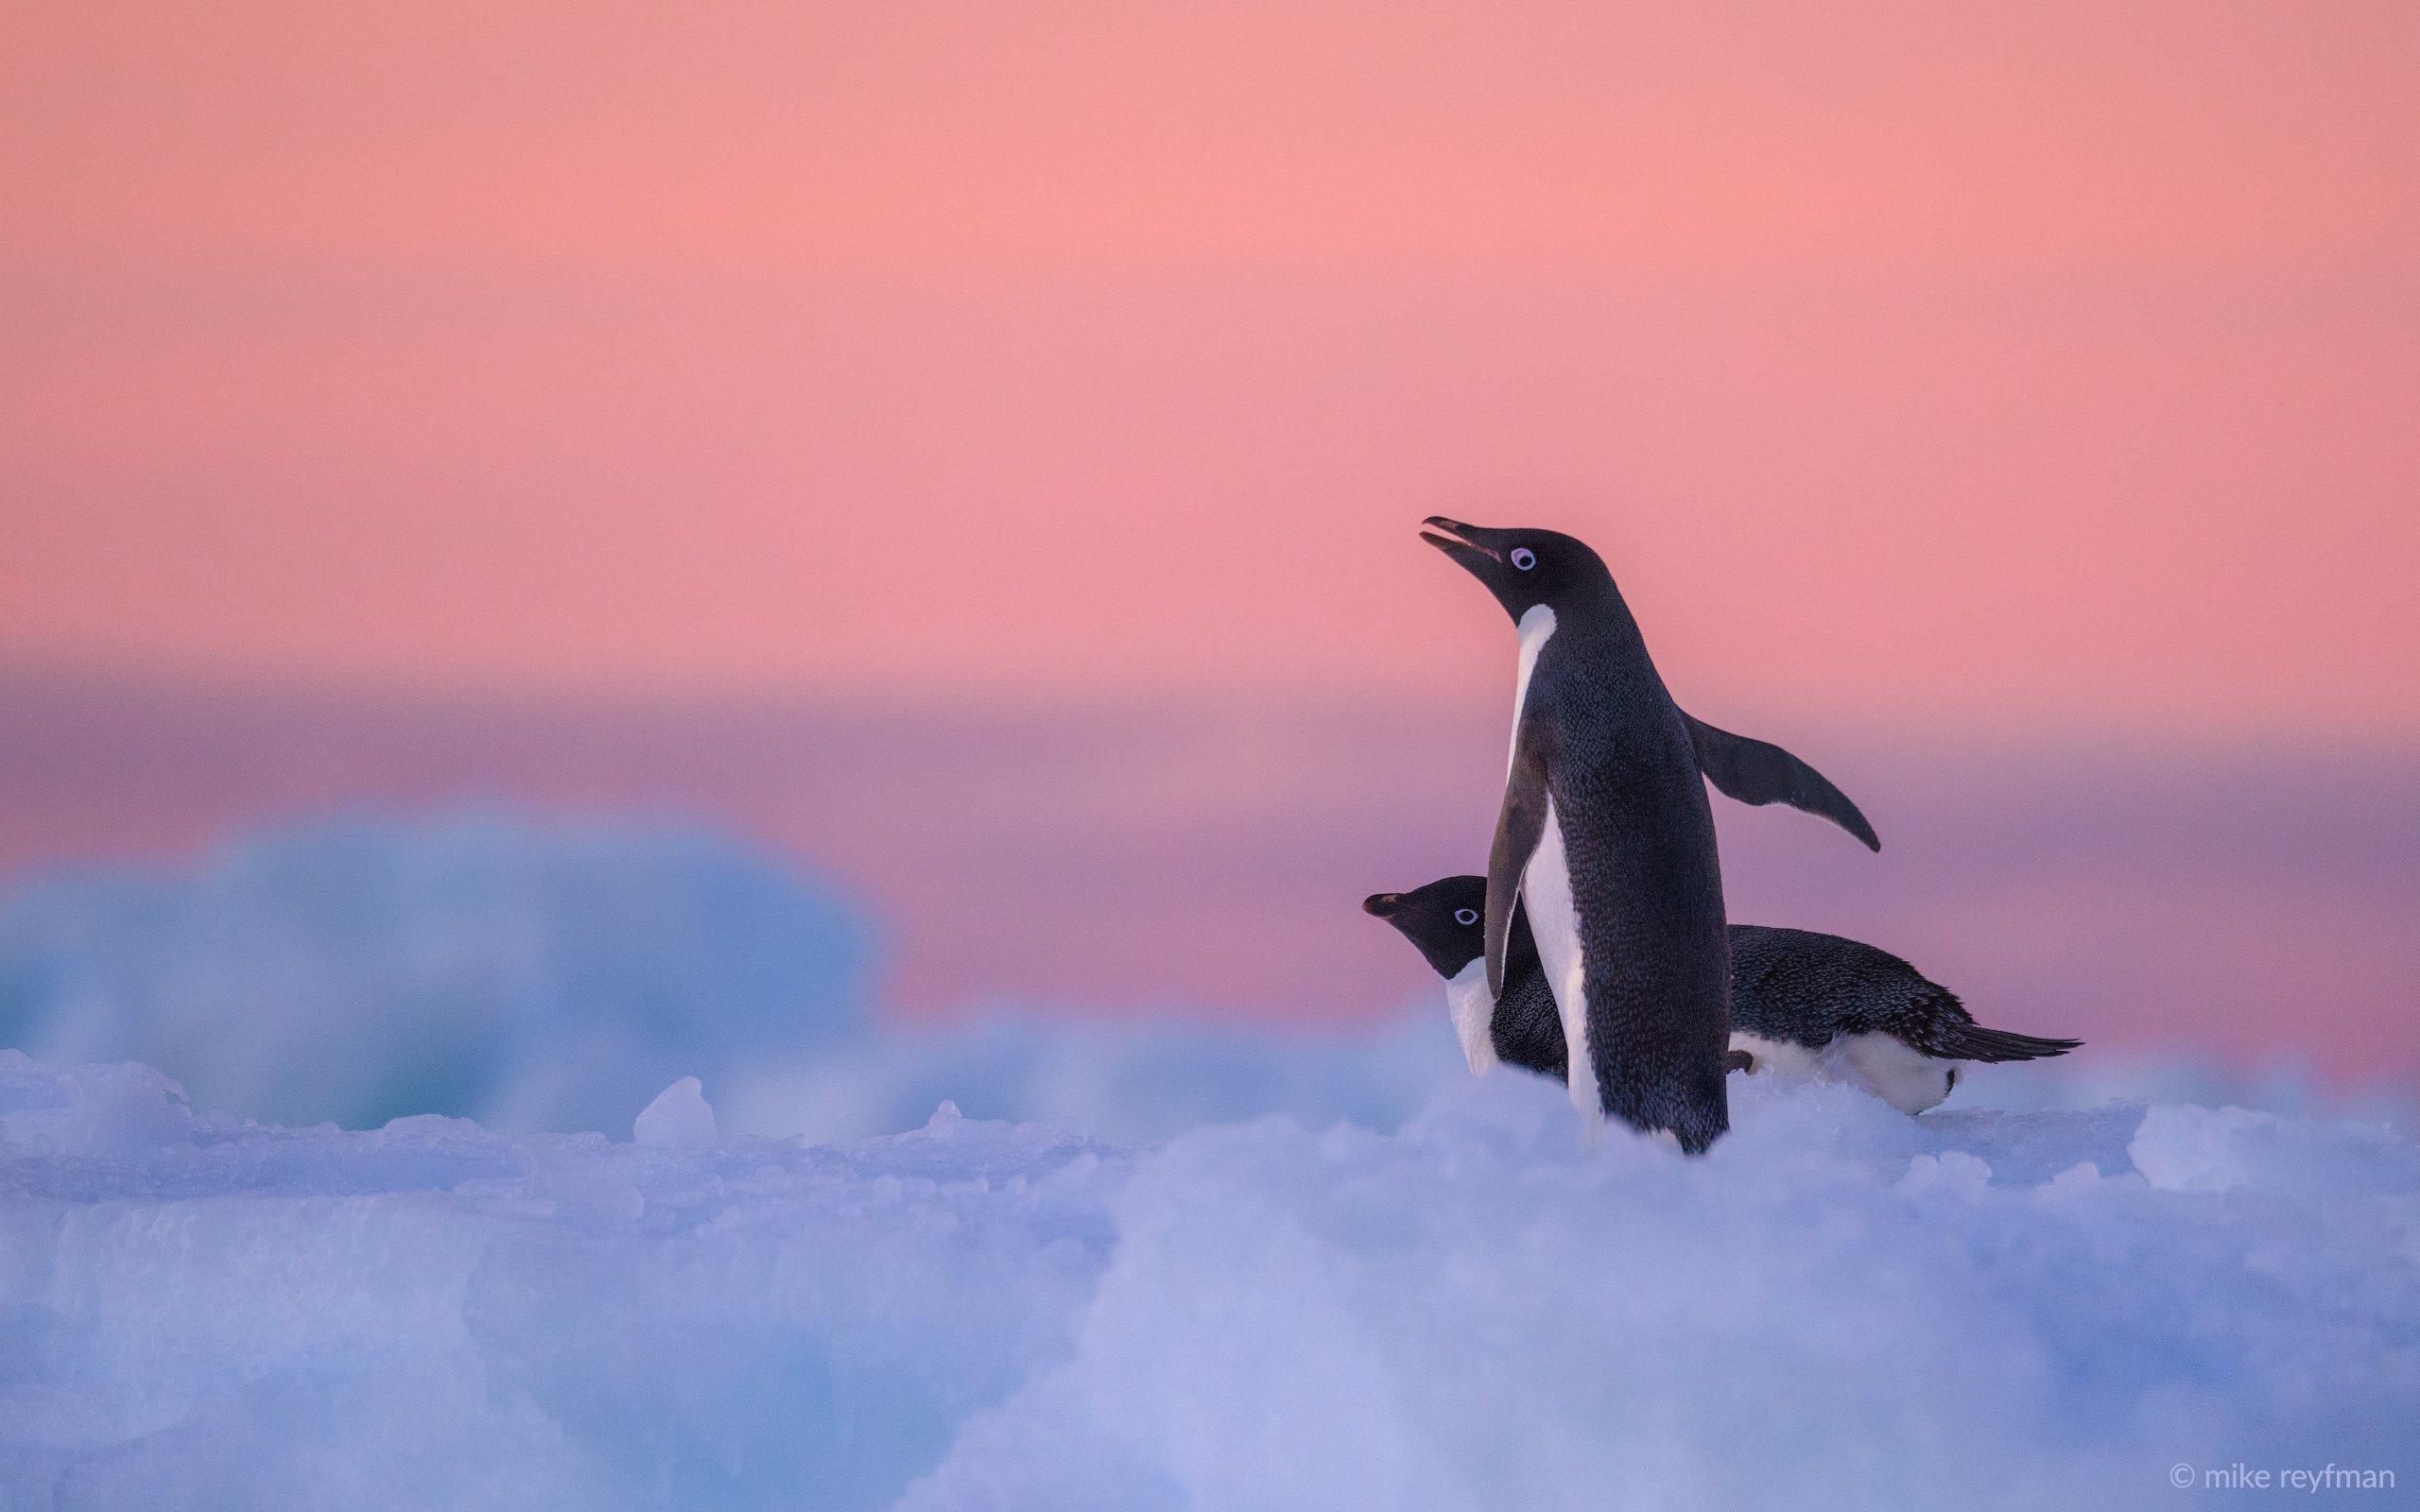 adelie, penguin, antarctic, antarctica, ice, blue, pink, cold, romantic, extreme, Майк Рейфман